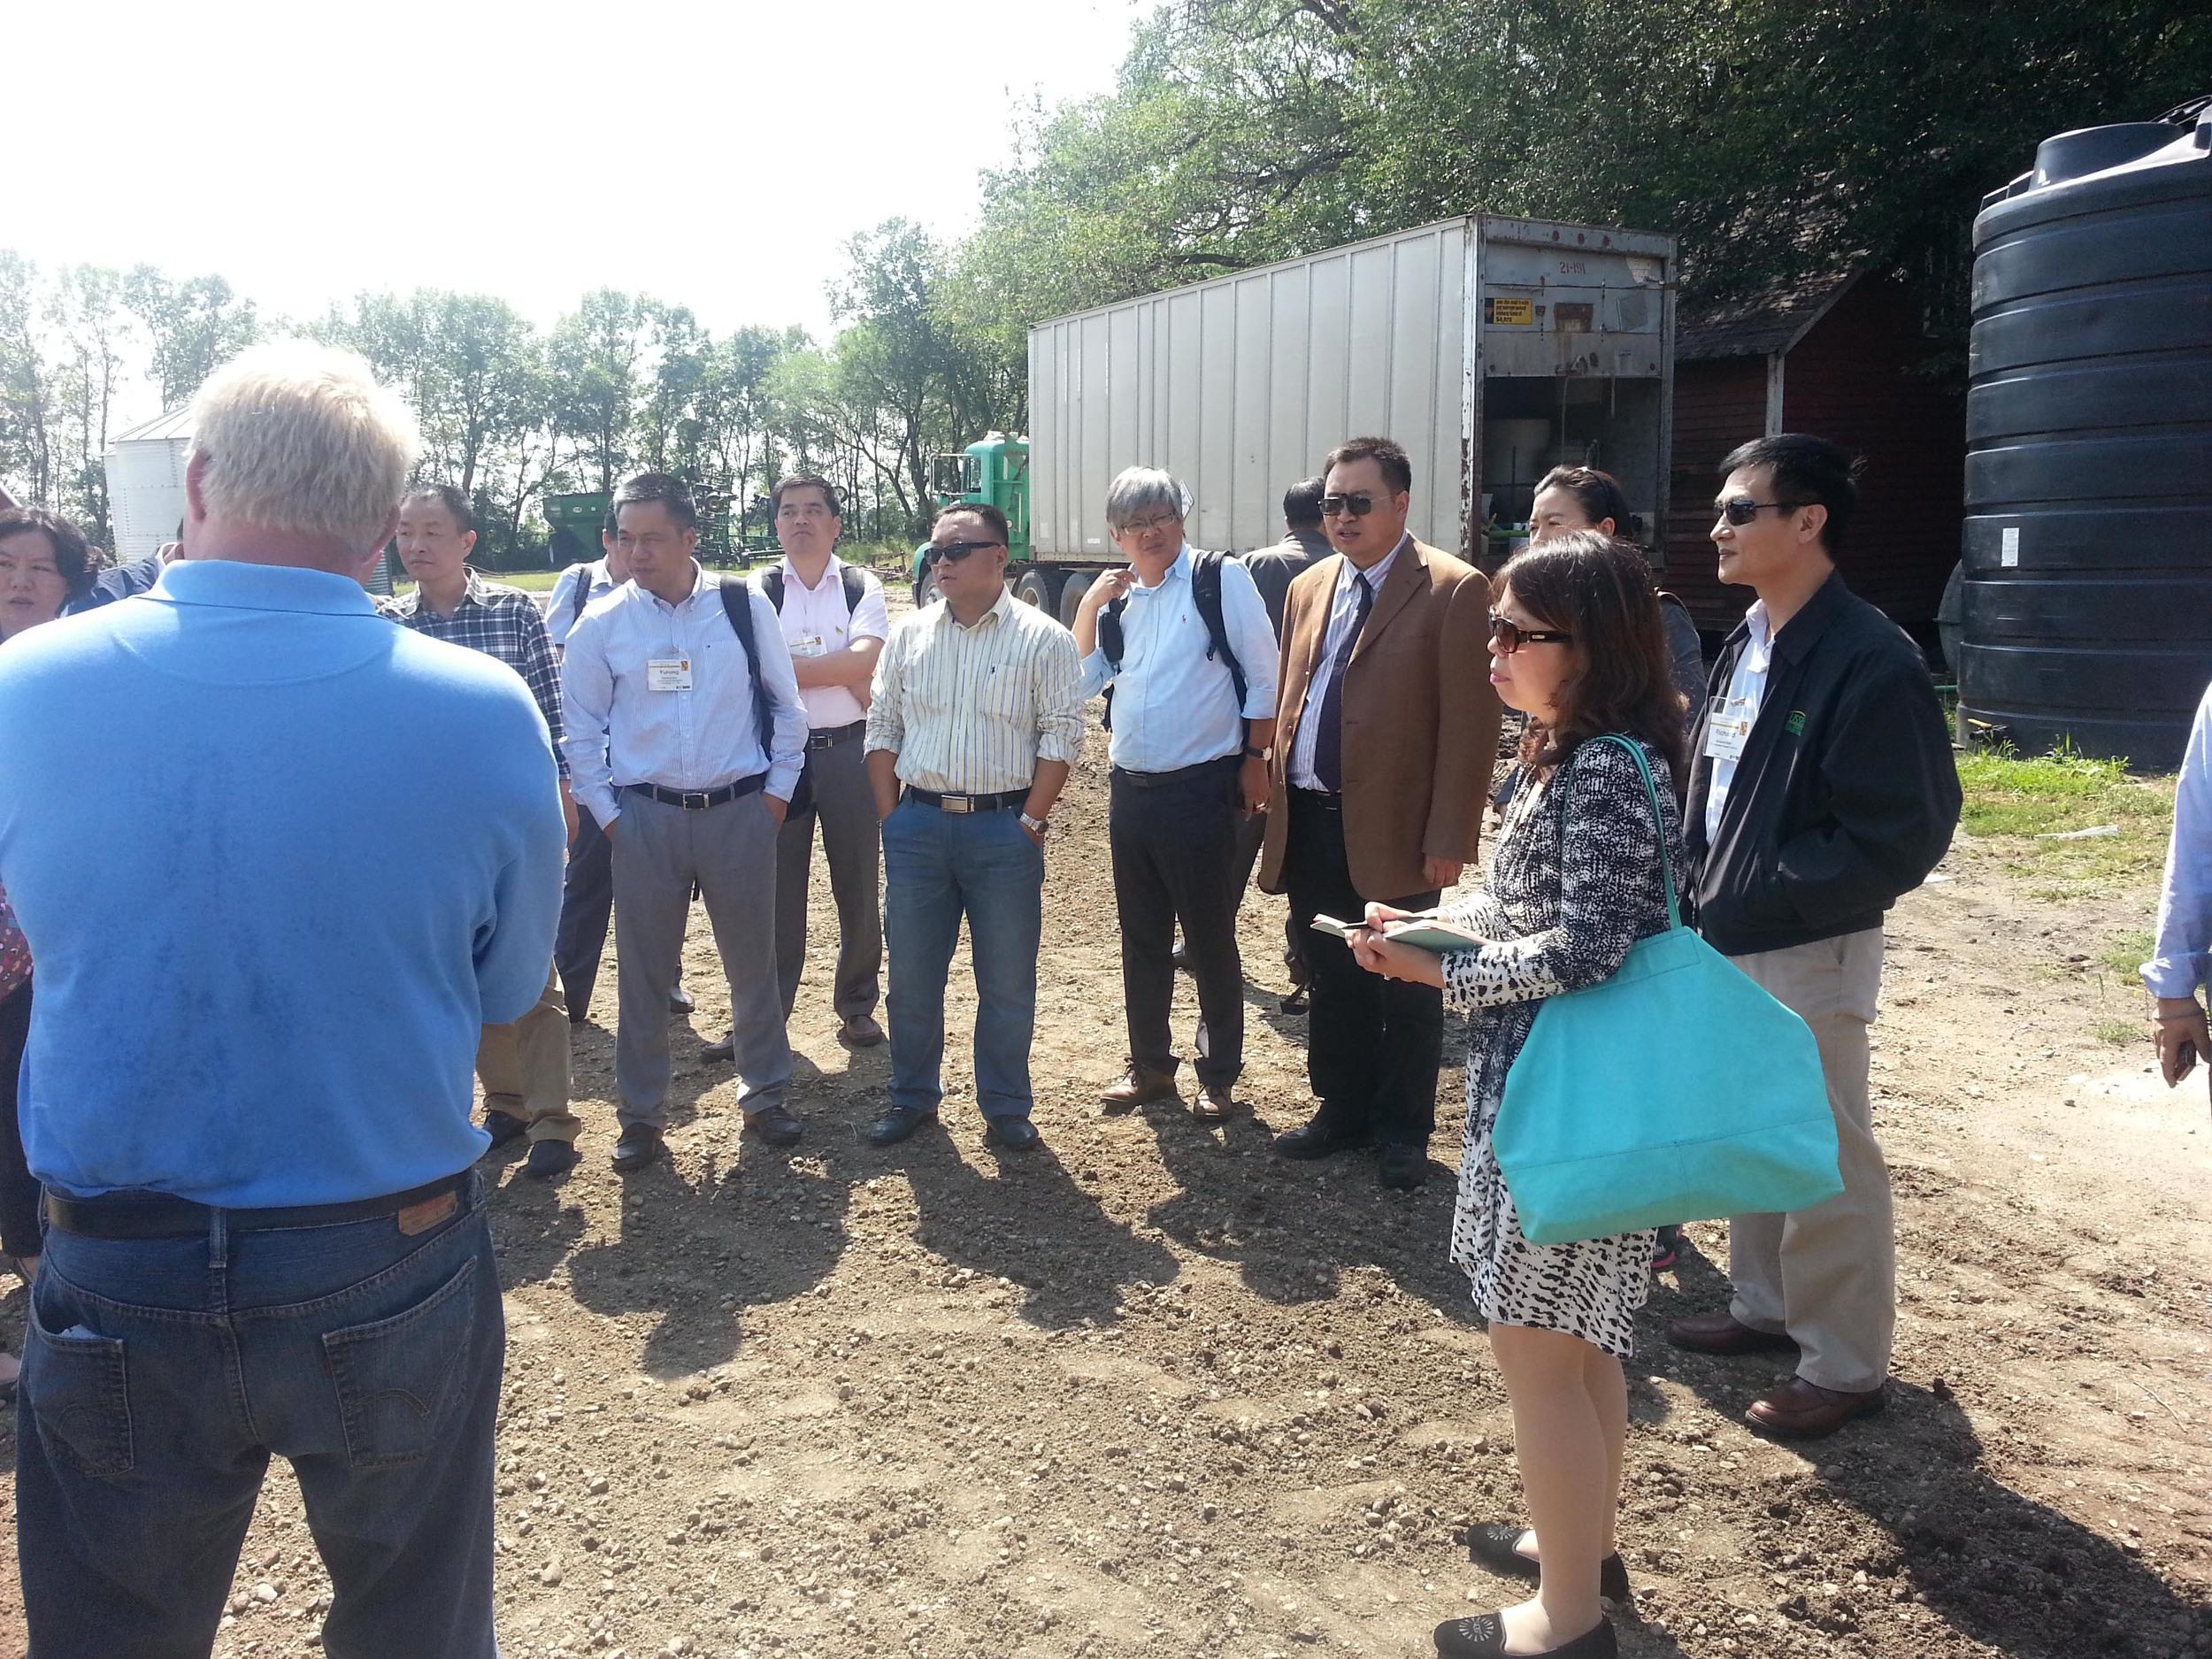 2014 China Feed Manufacturing SC at Scott Gauslow's farm 2.jpg